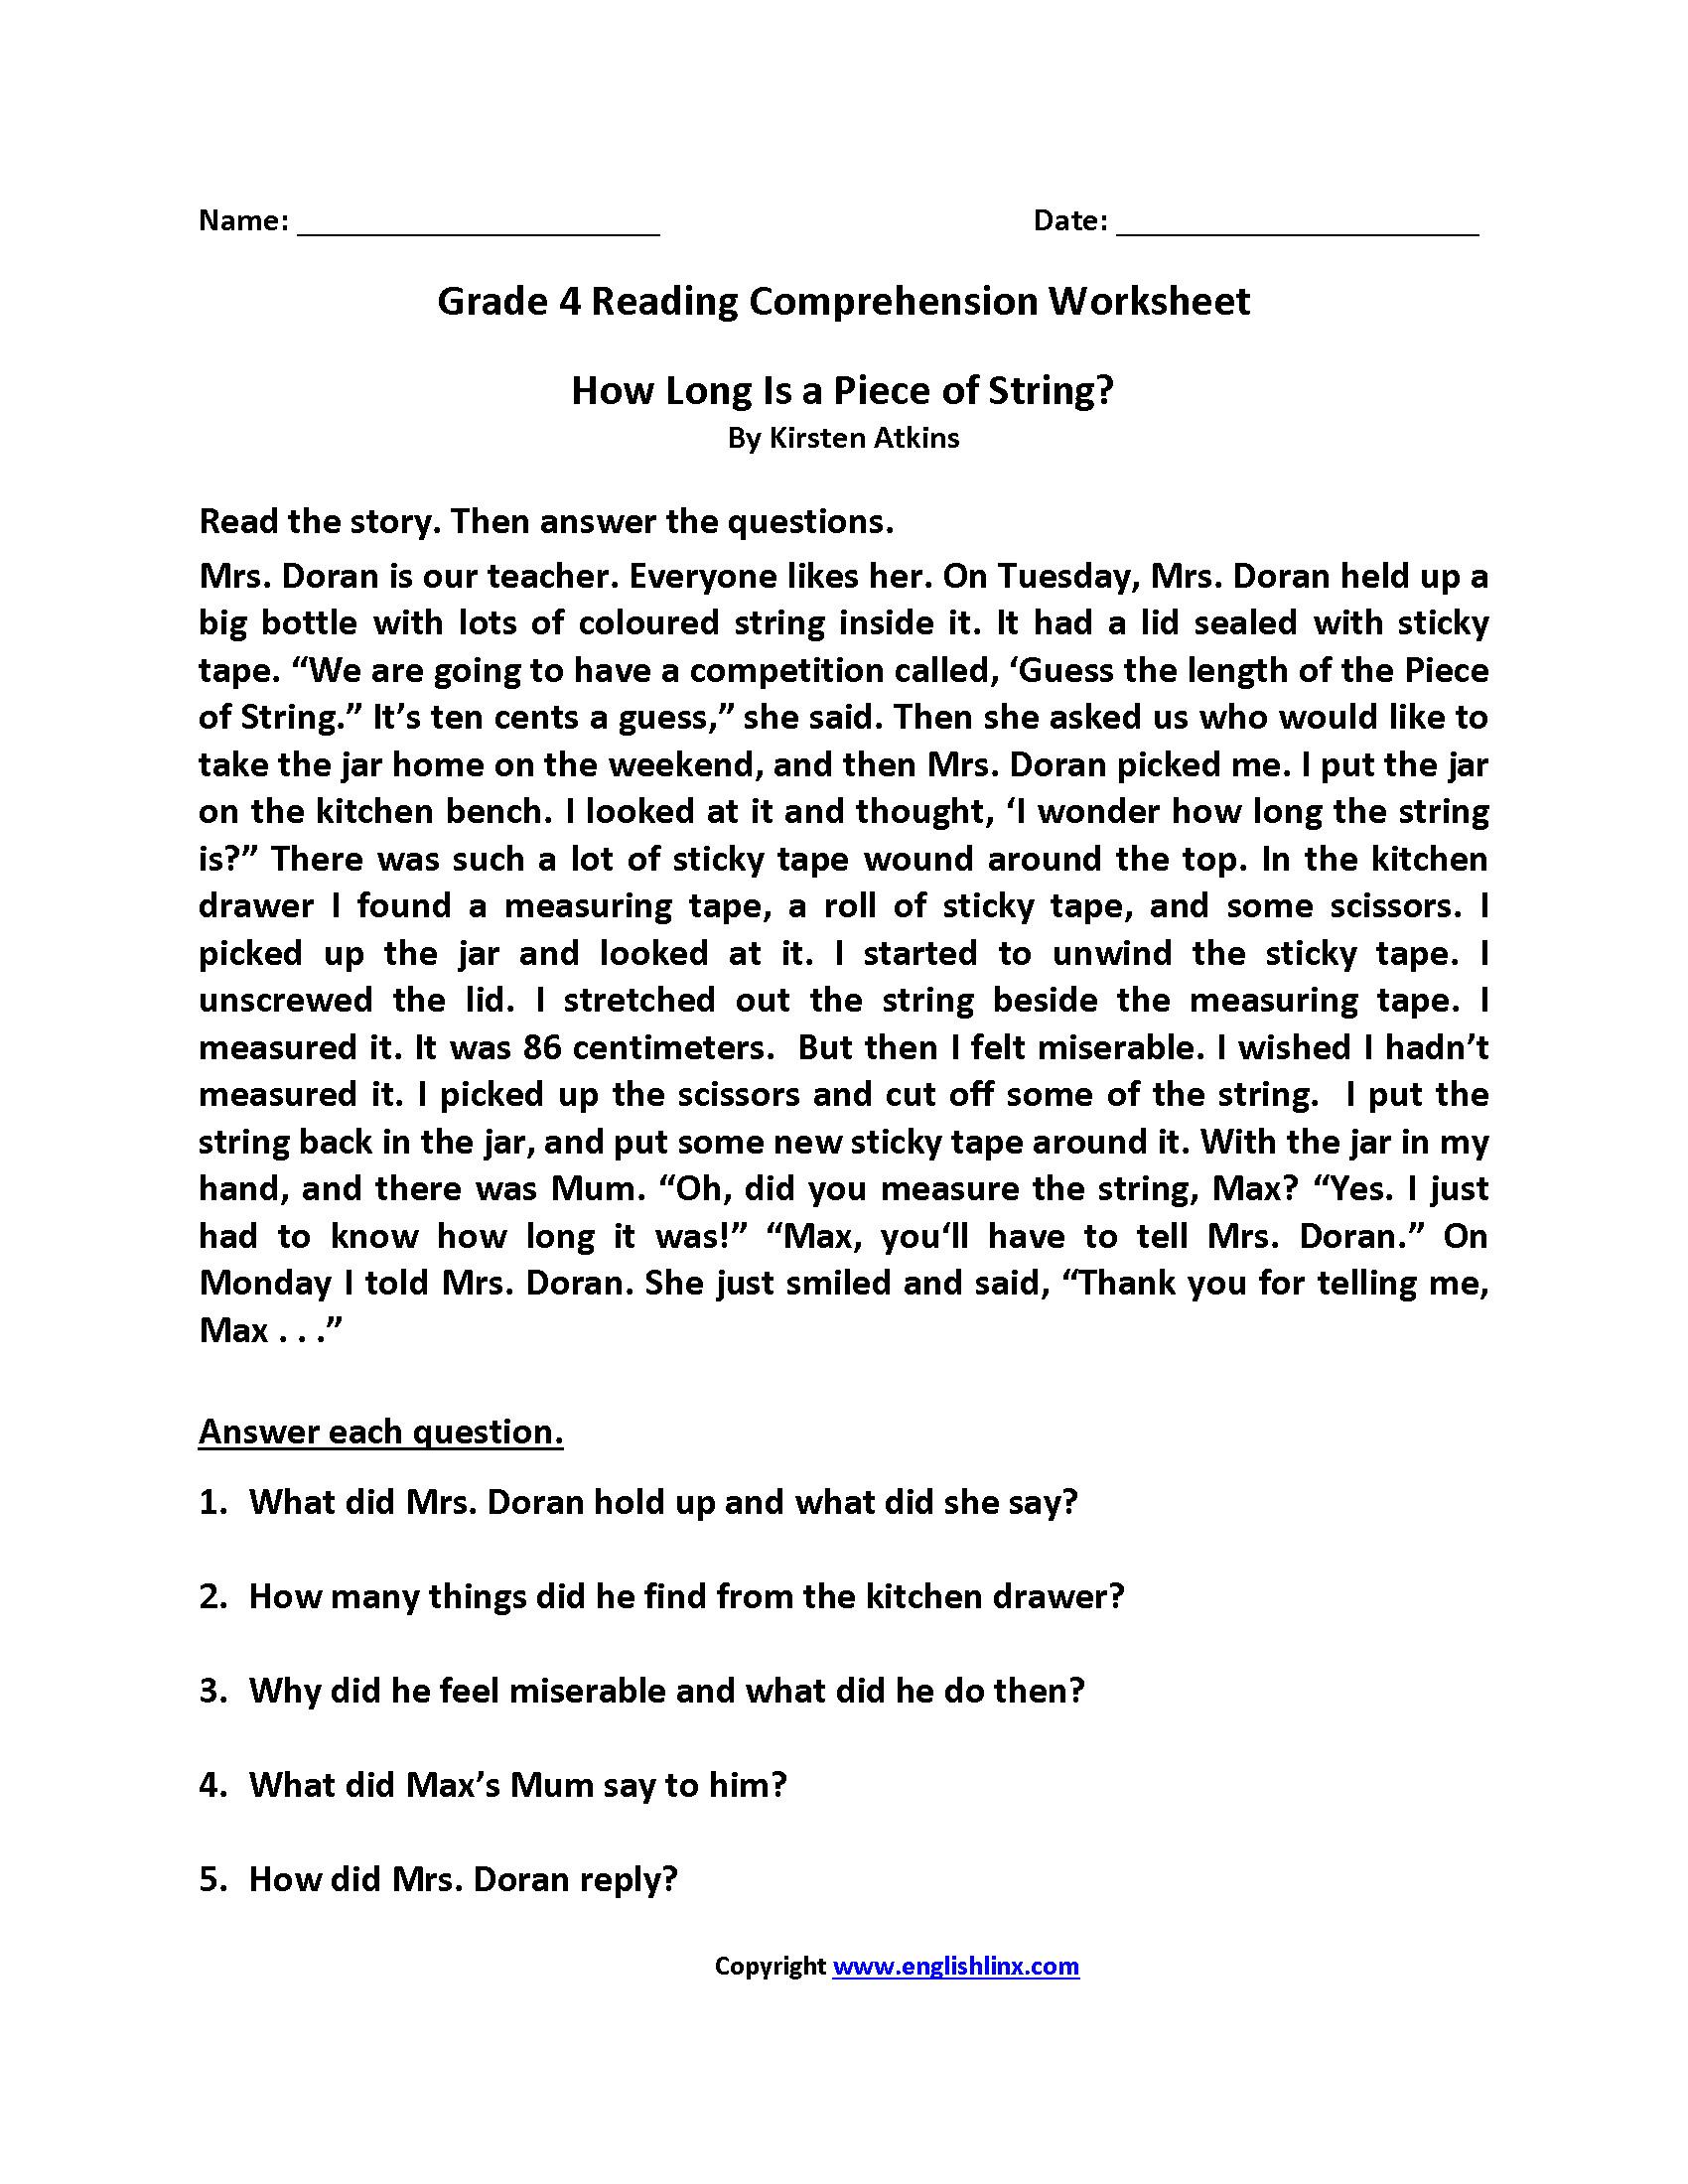 4 Sample Grade 4 Reading Comprehension